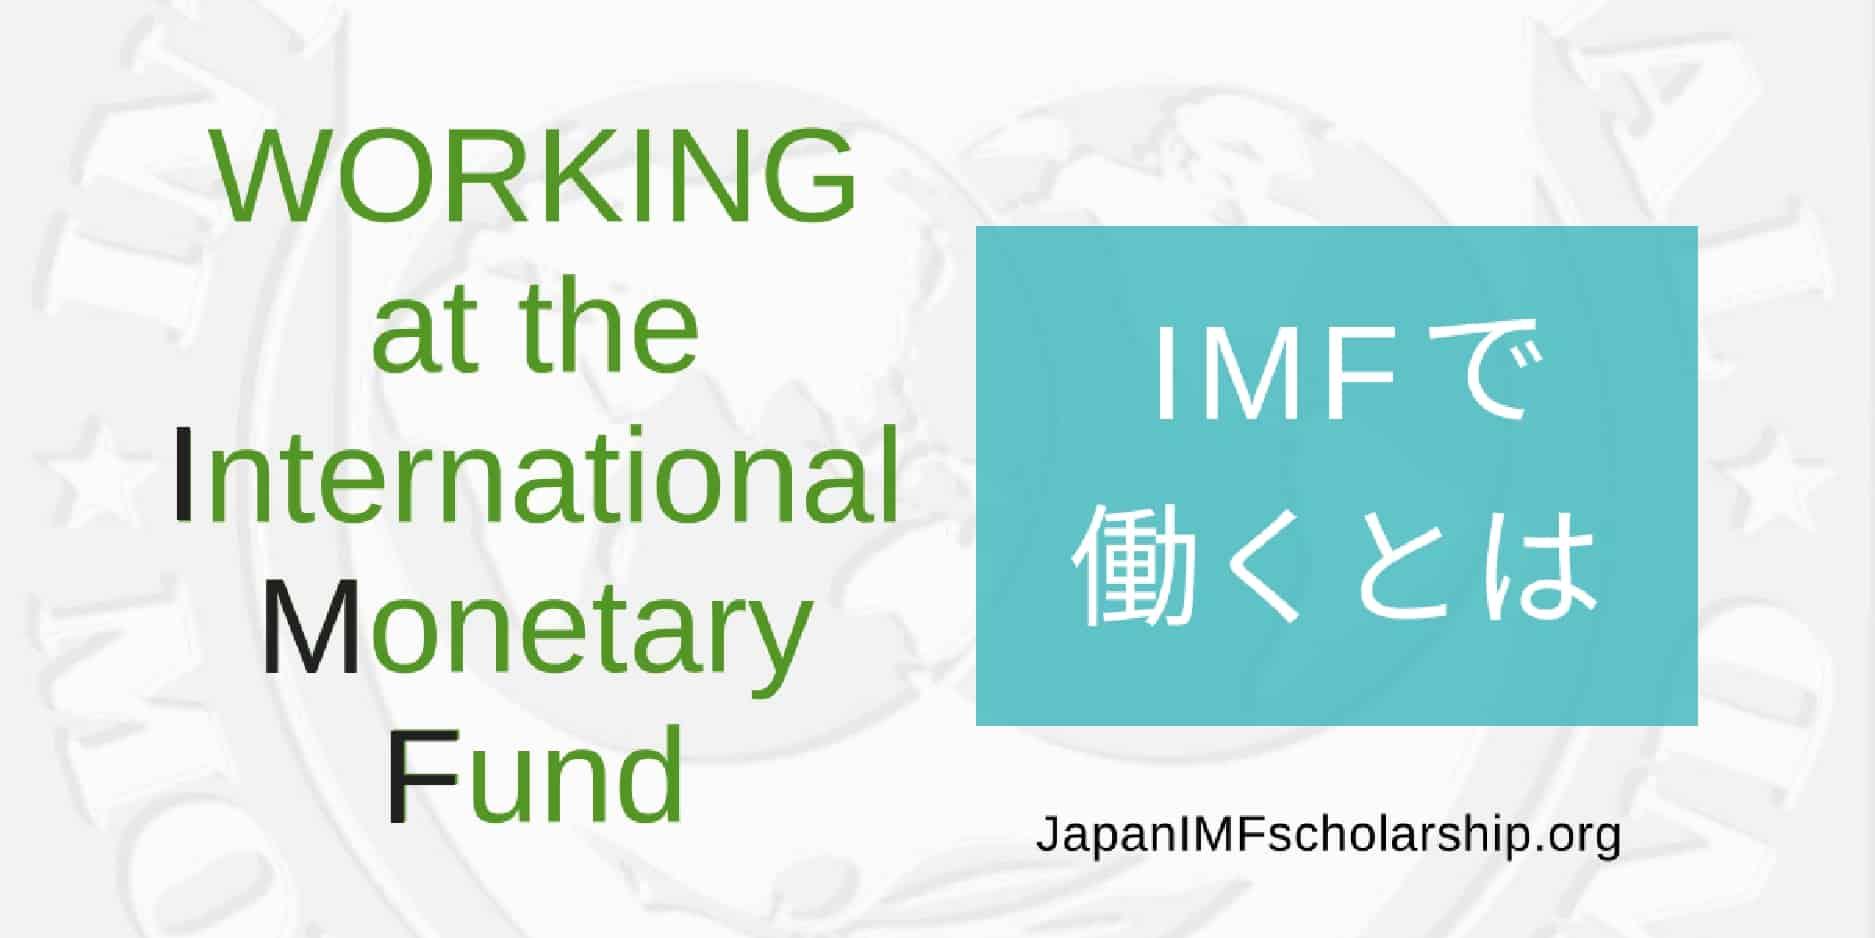 jisp web-fb working at the IMF | visit japanimfscholarship.org